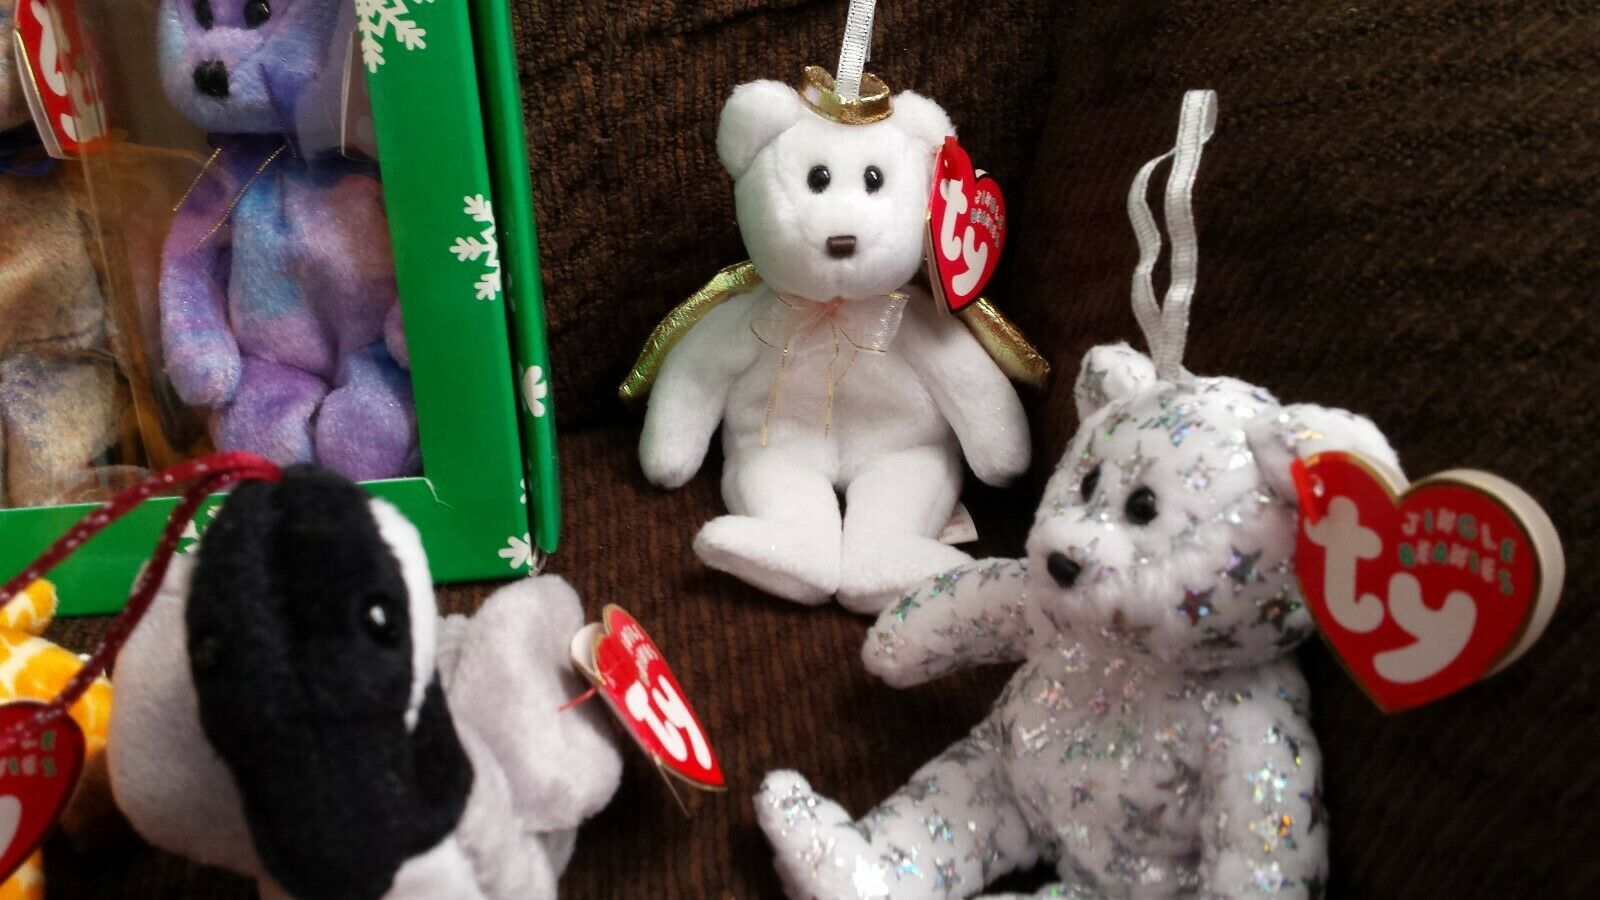 Lot 15 Jingle Beanies, Clubby Set, Halos, Peace, Peace, Peace, Mistletoe, Holiday Teddy & more eb034f